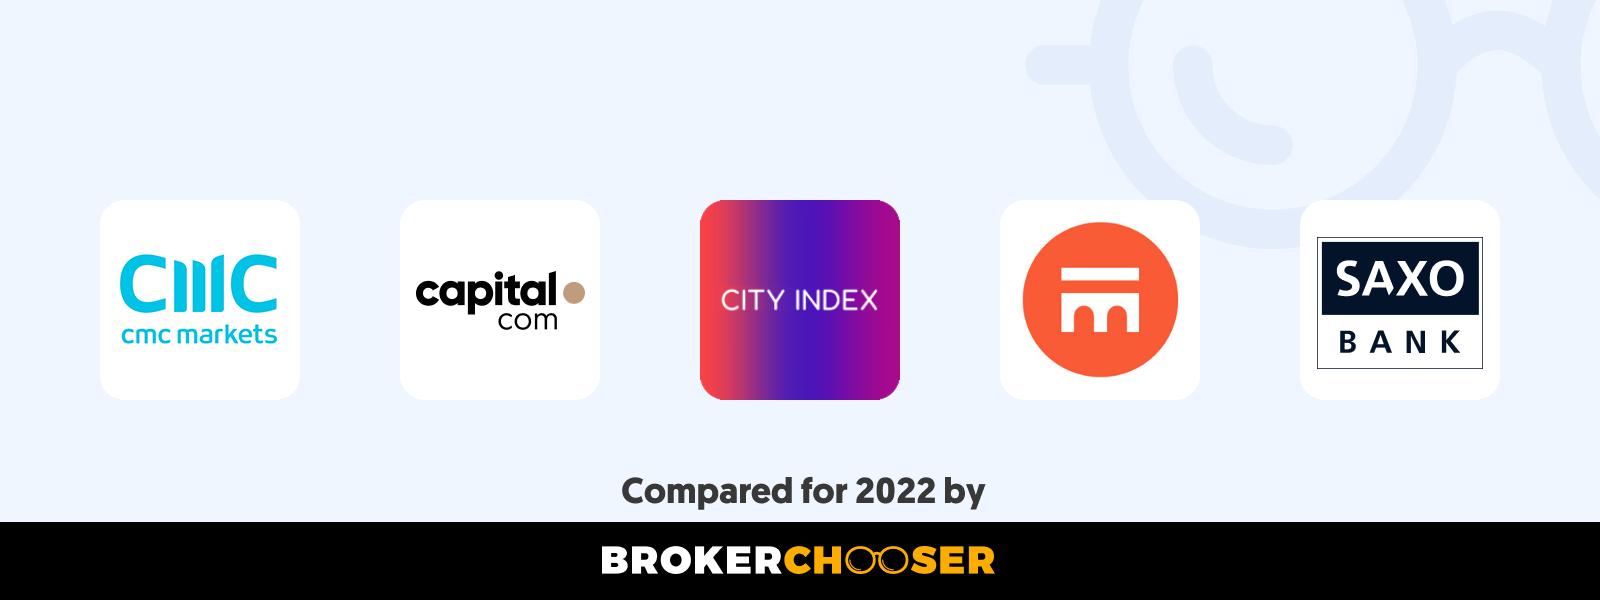 Best forex brokers for beginners in Australia in 2021